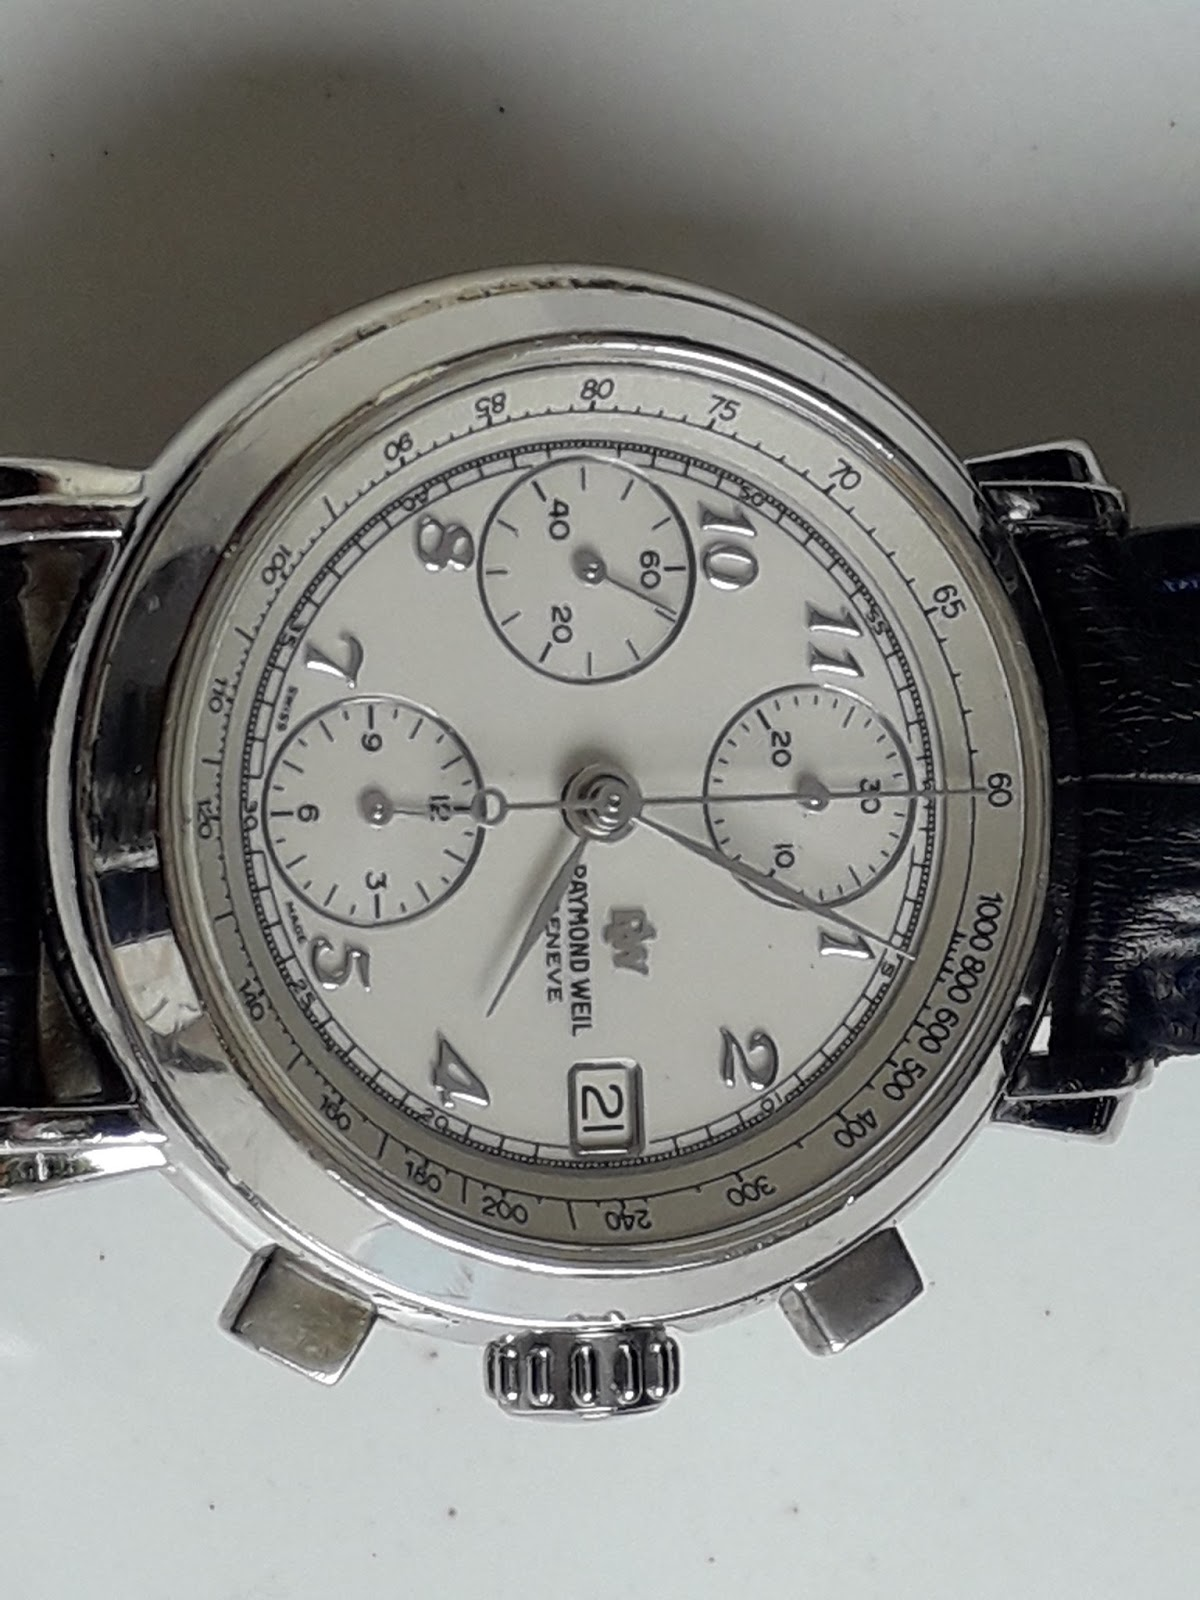 Batavia Jam Raymond Weil Chronograph Cal 7760 Manual Win Sold Charles Jourdan 1016 1312c Hitam Ring Silver Plat Putih